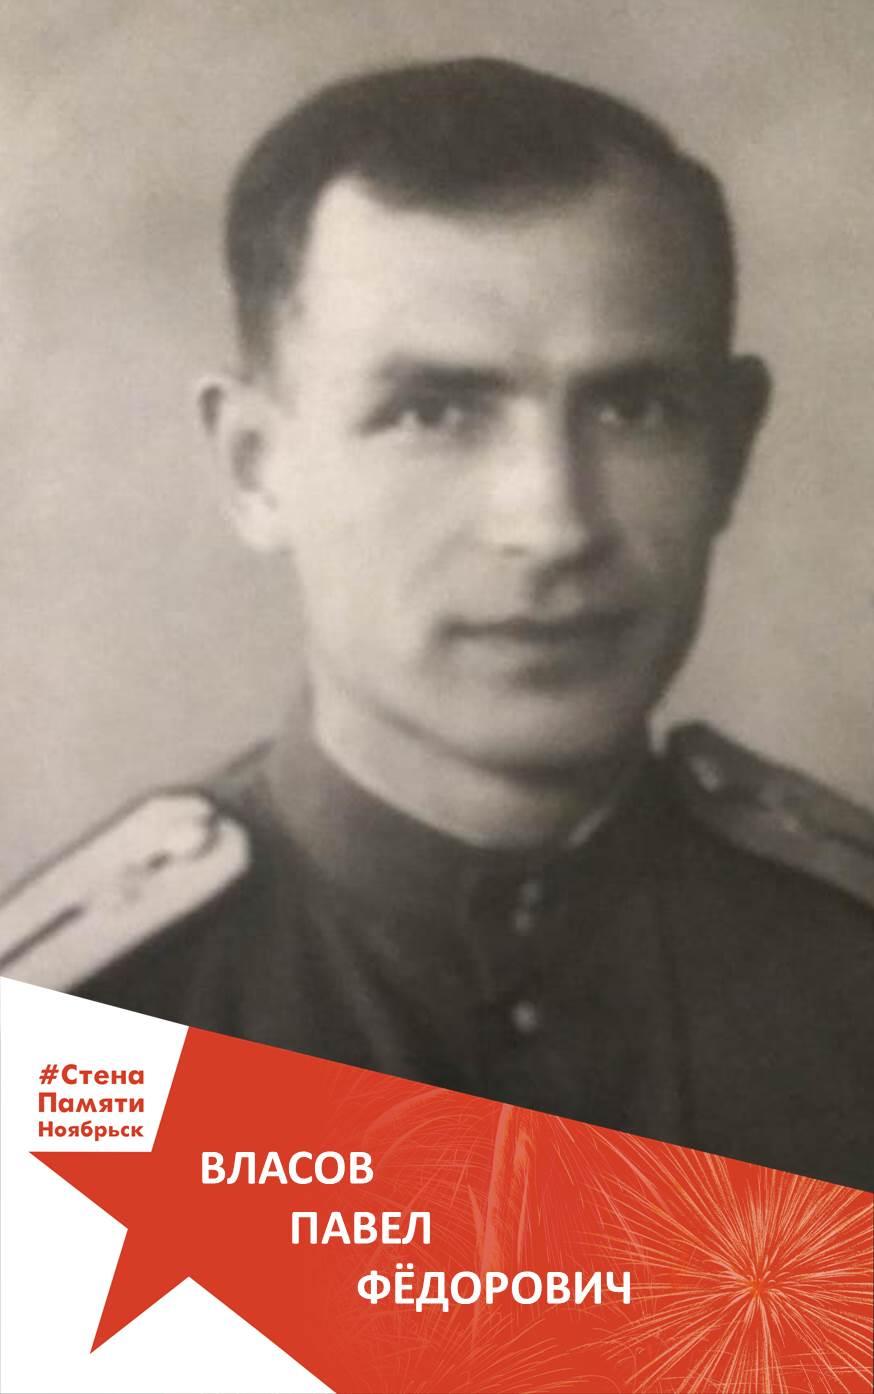 Власов Павел Фёдорович